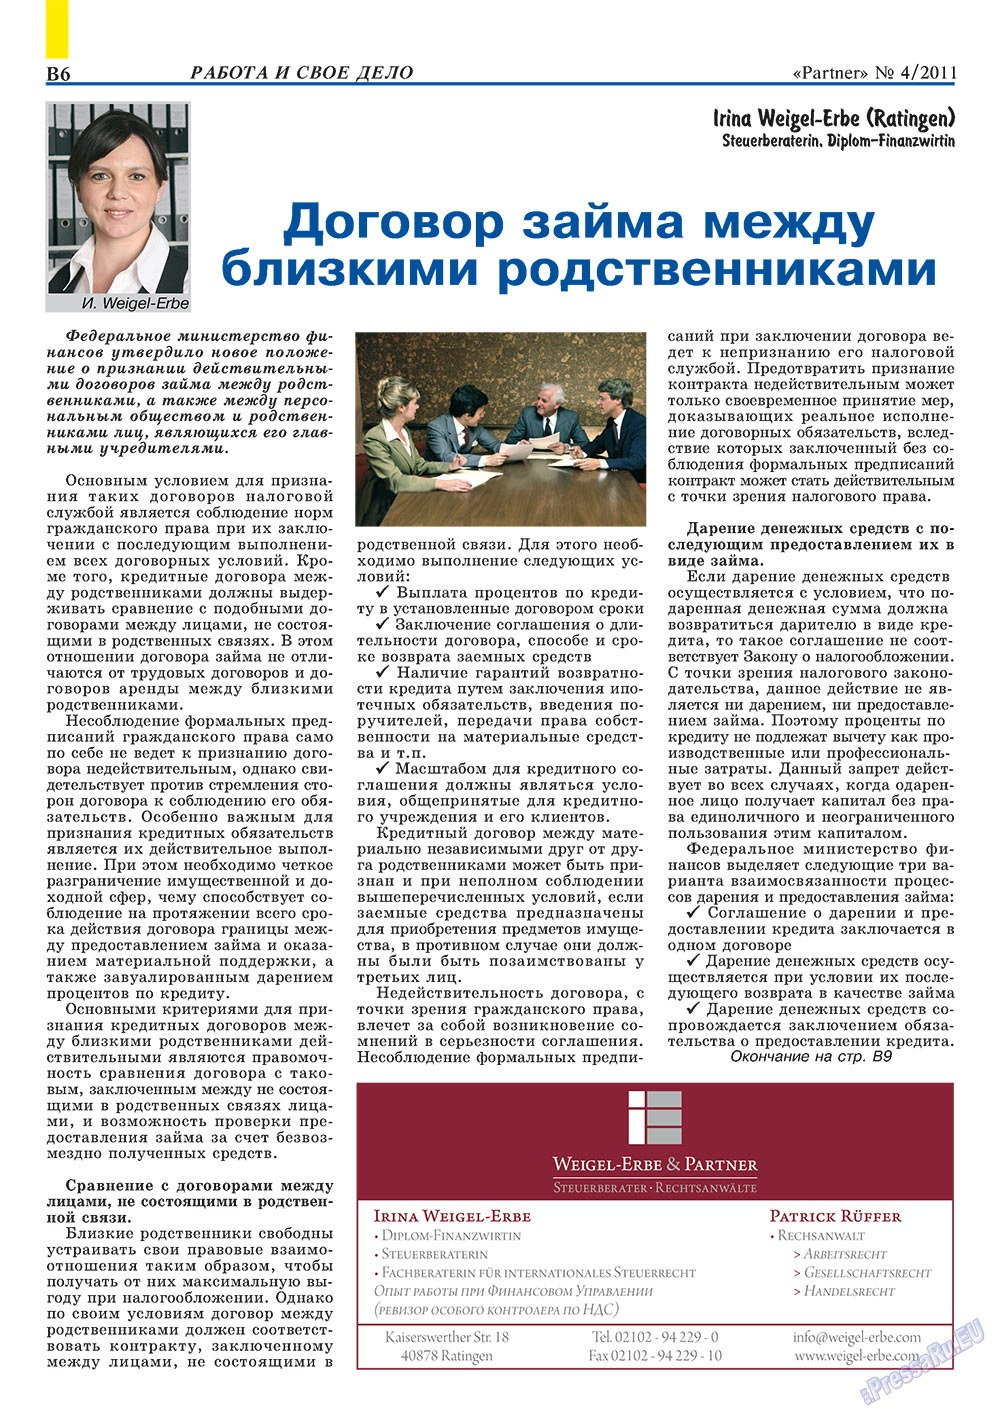 Партнер-север (журнал). 2011 год, номер 4, стр. 16